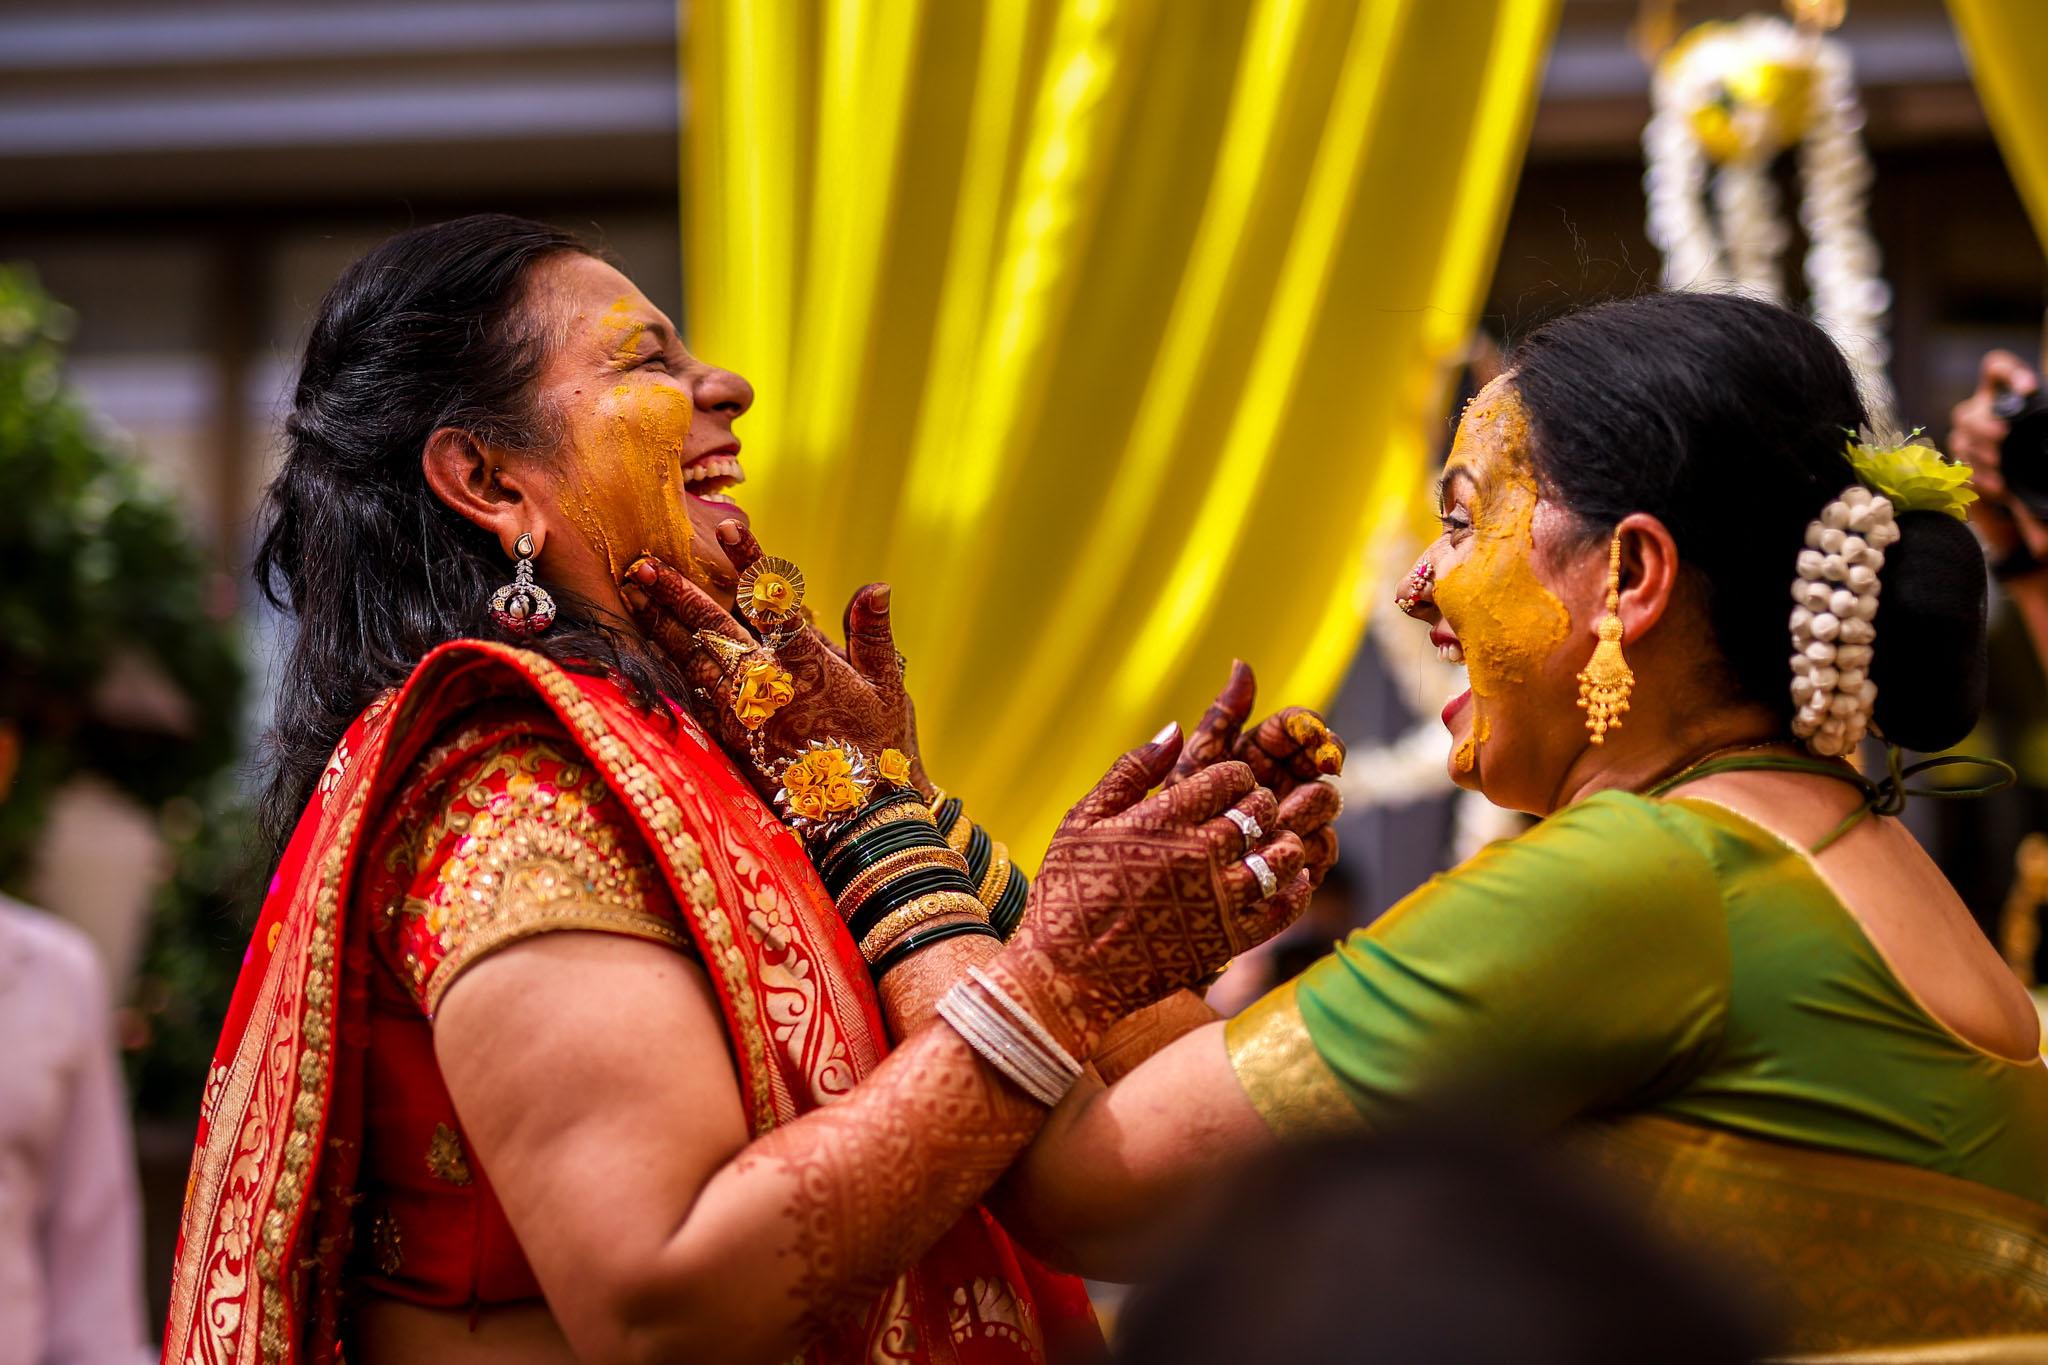 Mukti x Ojas Wedding Akshjay Sansare Photography Best wedding photographer in mumbai India Candid Cinematic Films videos-11.jpg